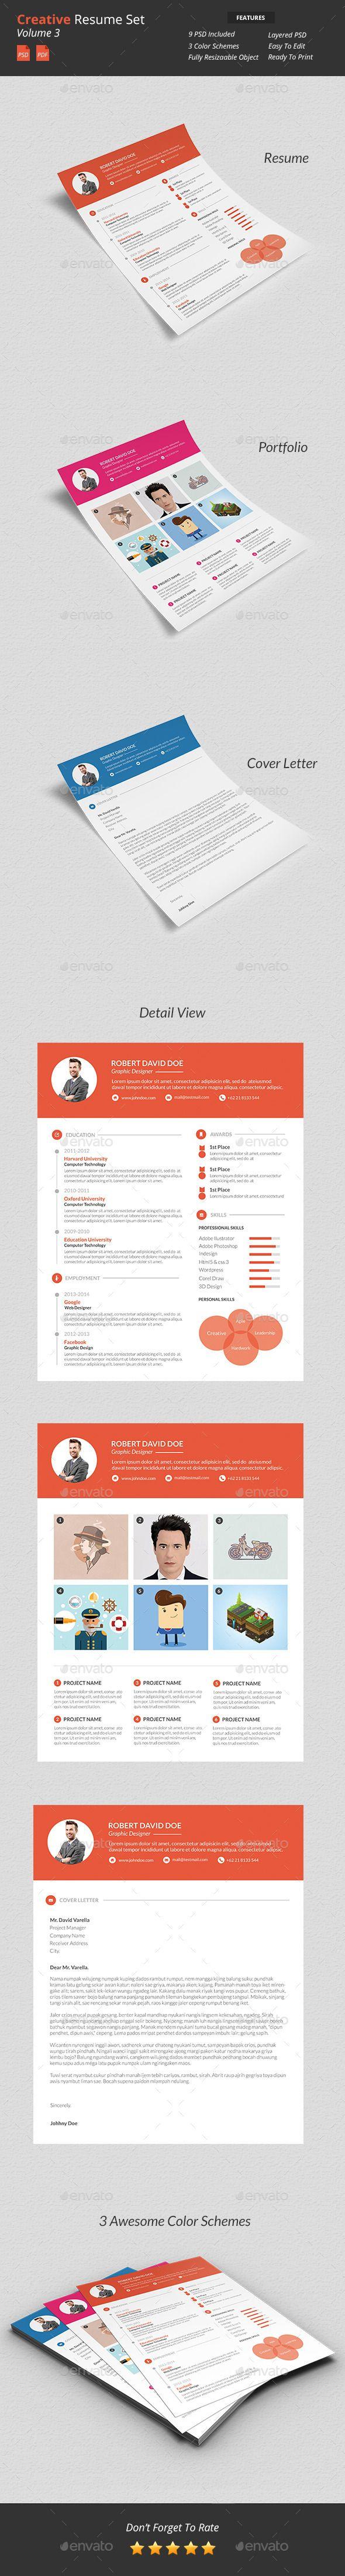 Creative Resume Set v3